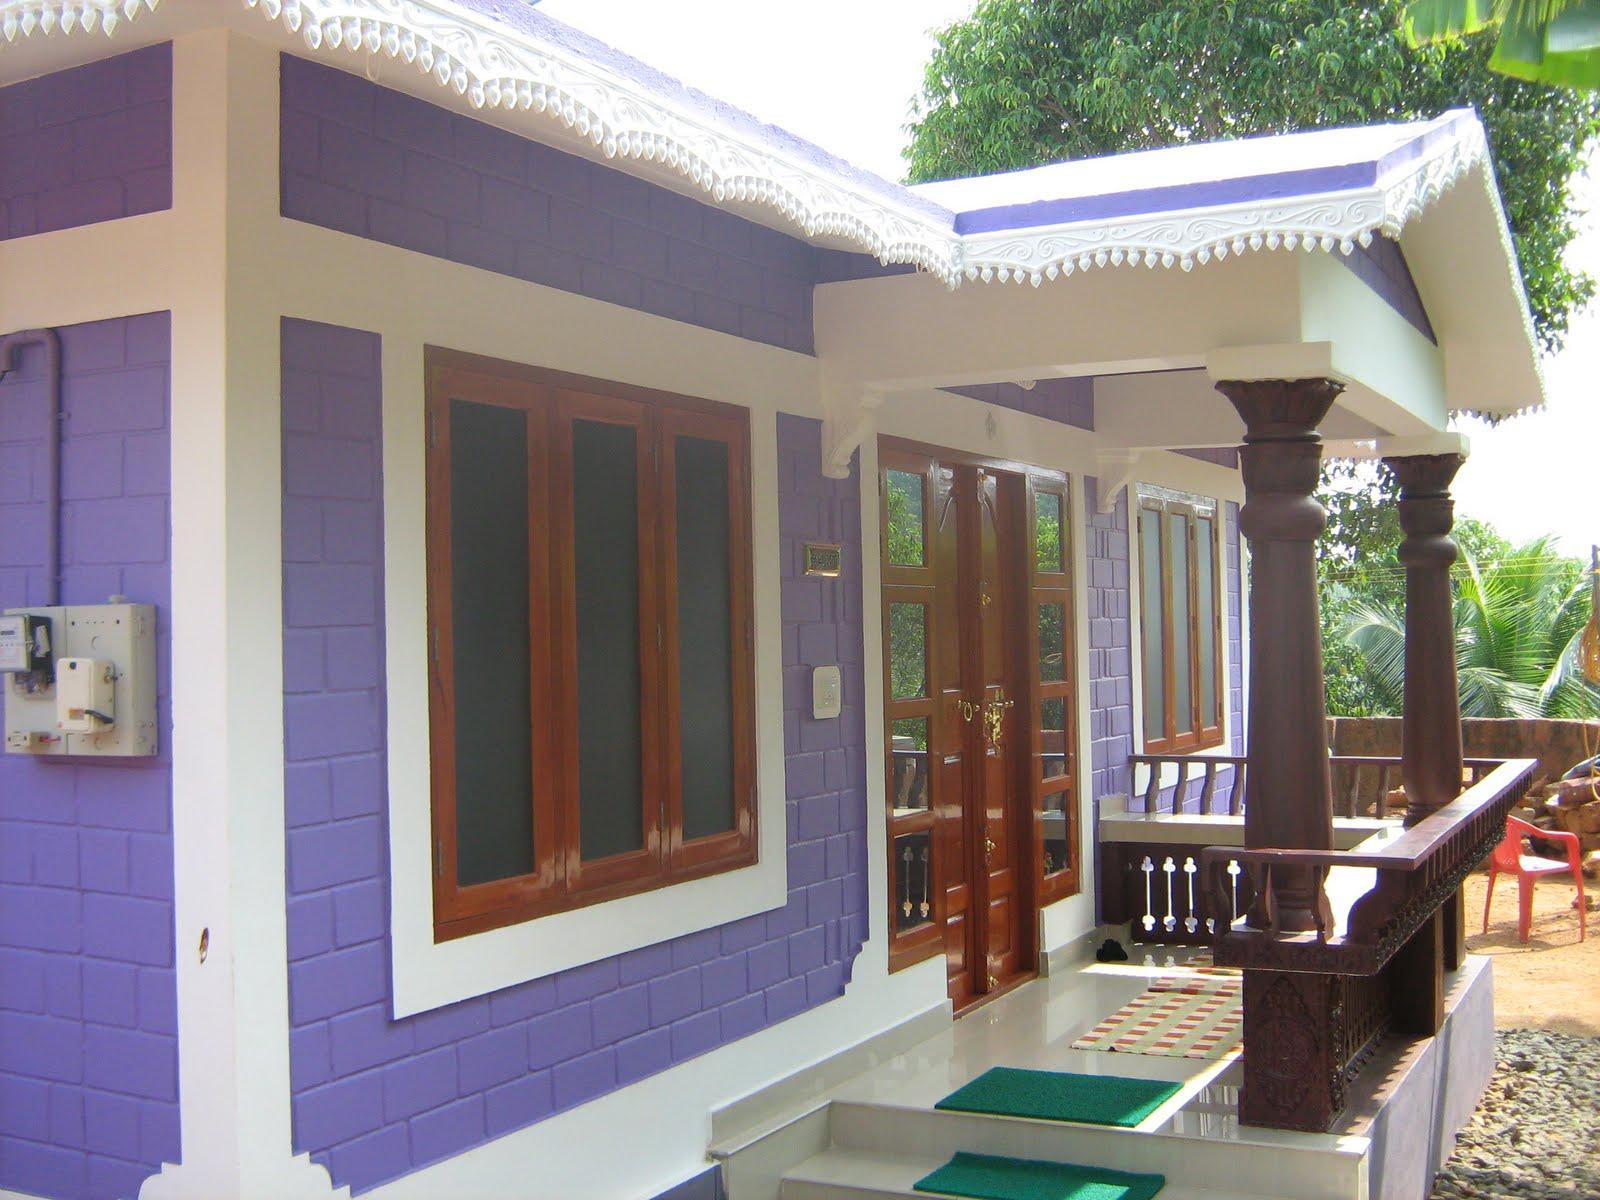 Home Design Software Building Blocks Free Download Interlock House In Kerala Joy Studio Design Gallery